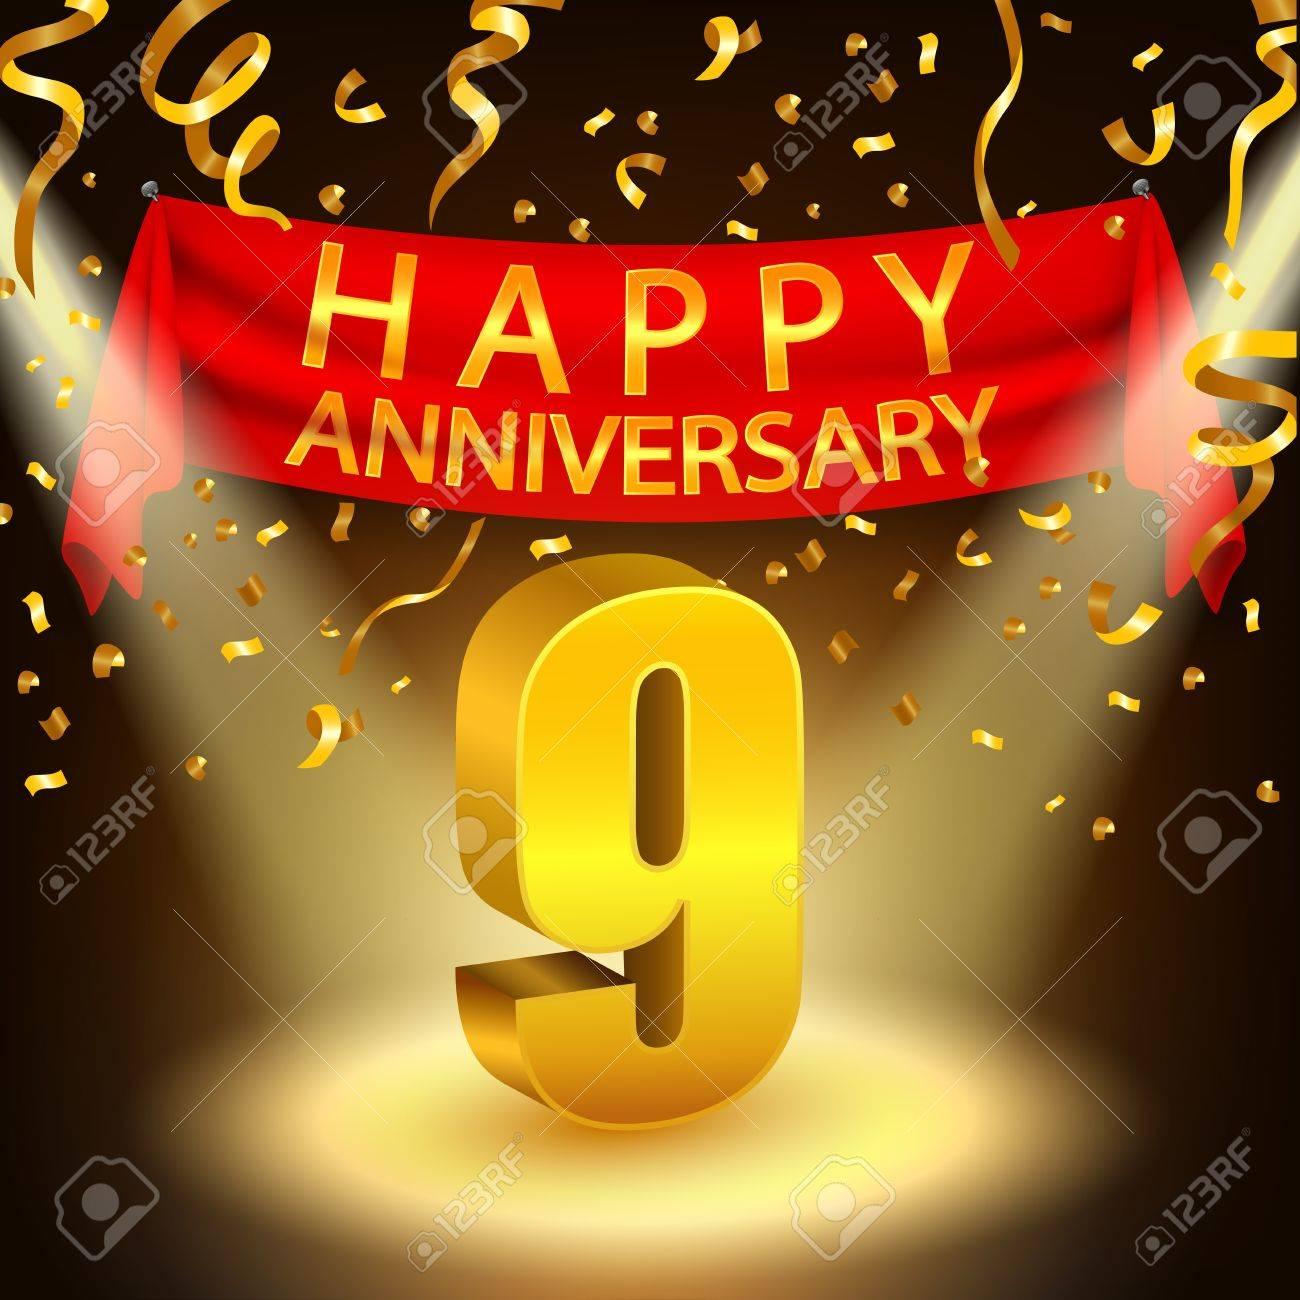 Happy 9th Anniversary Celebration With Golden Confetti And Spotlight